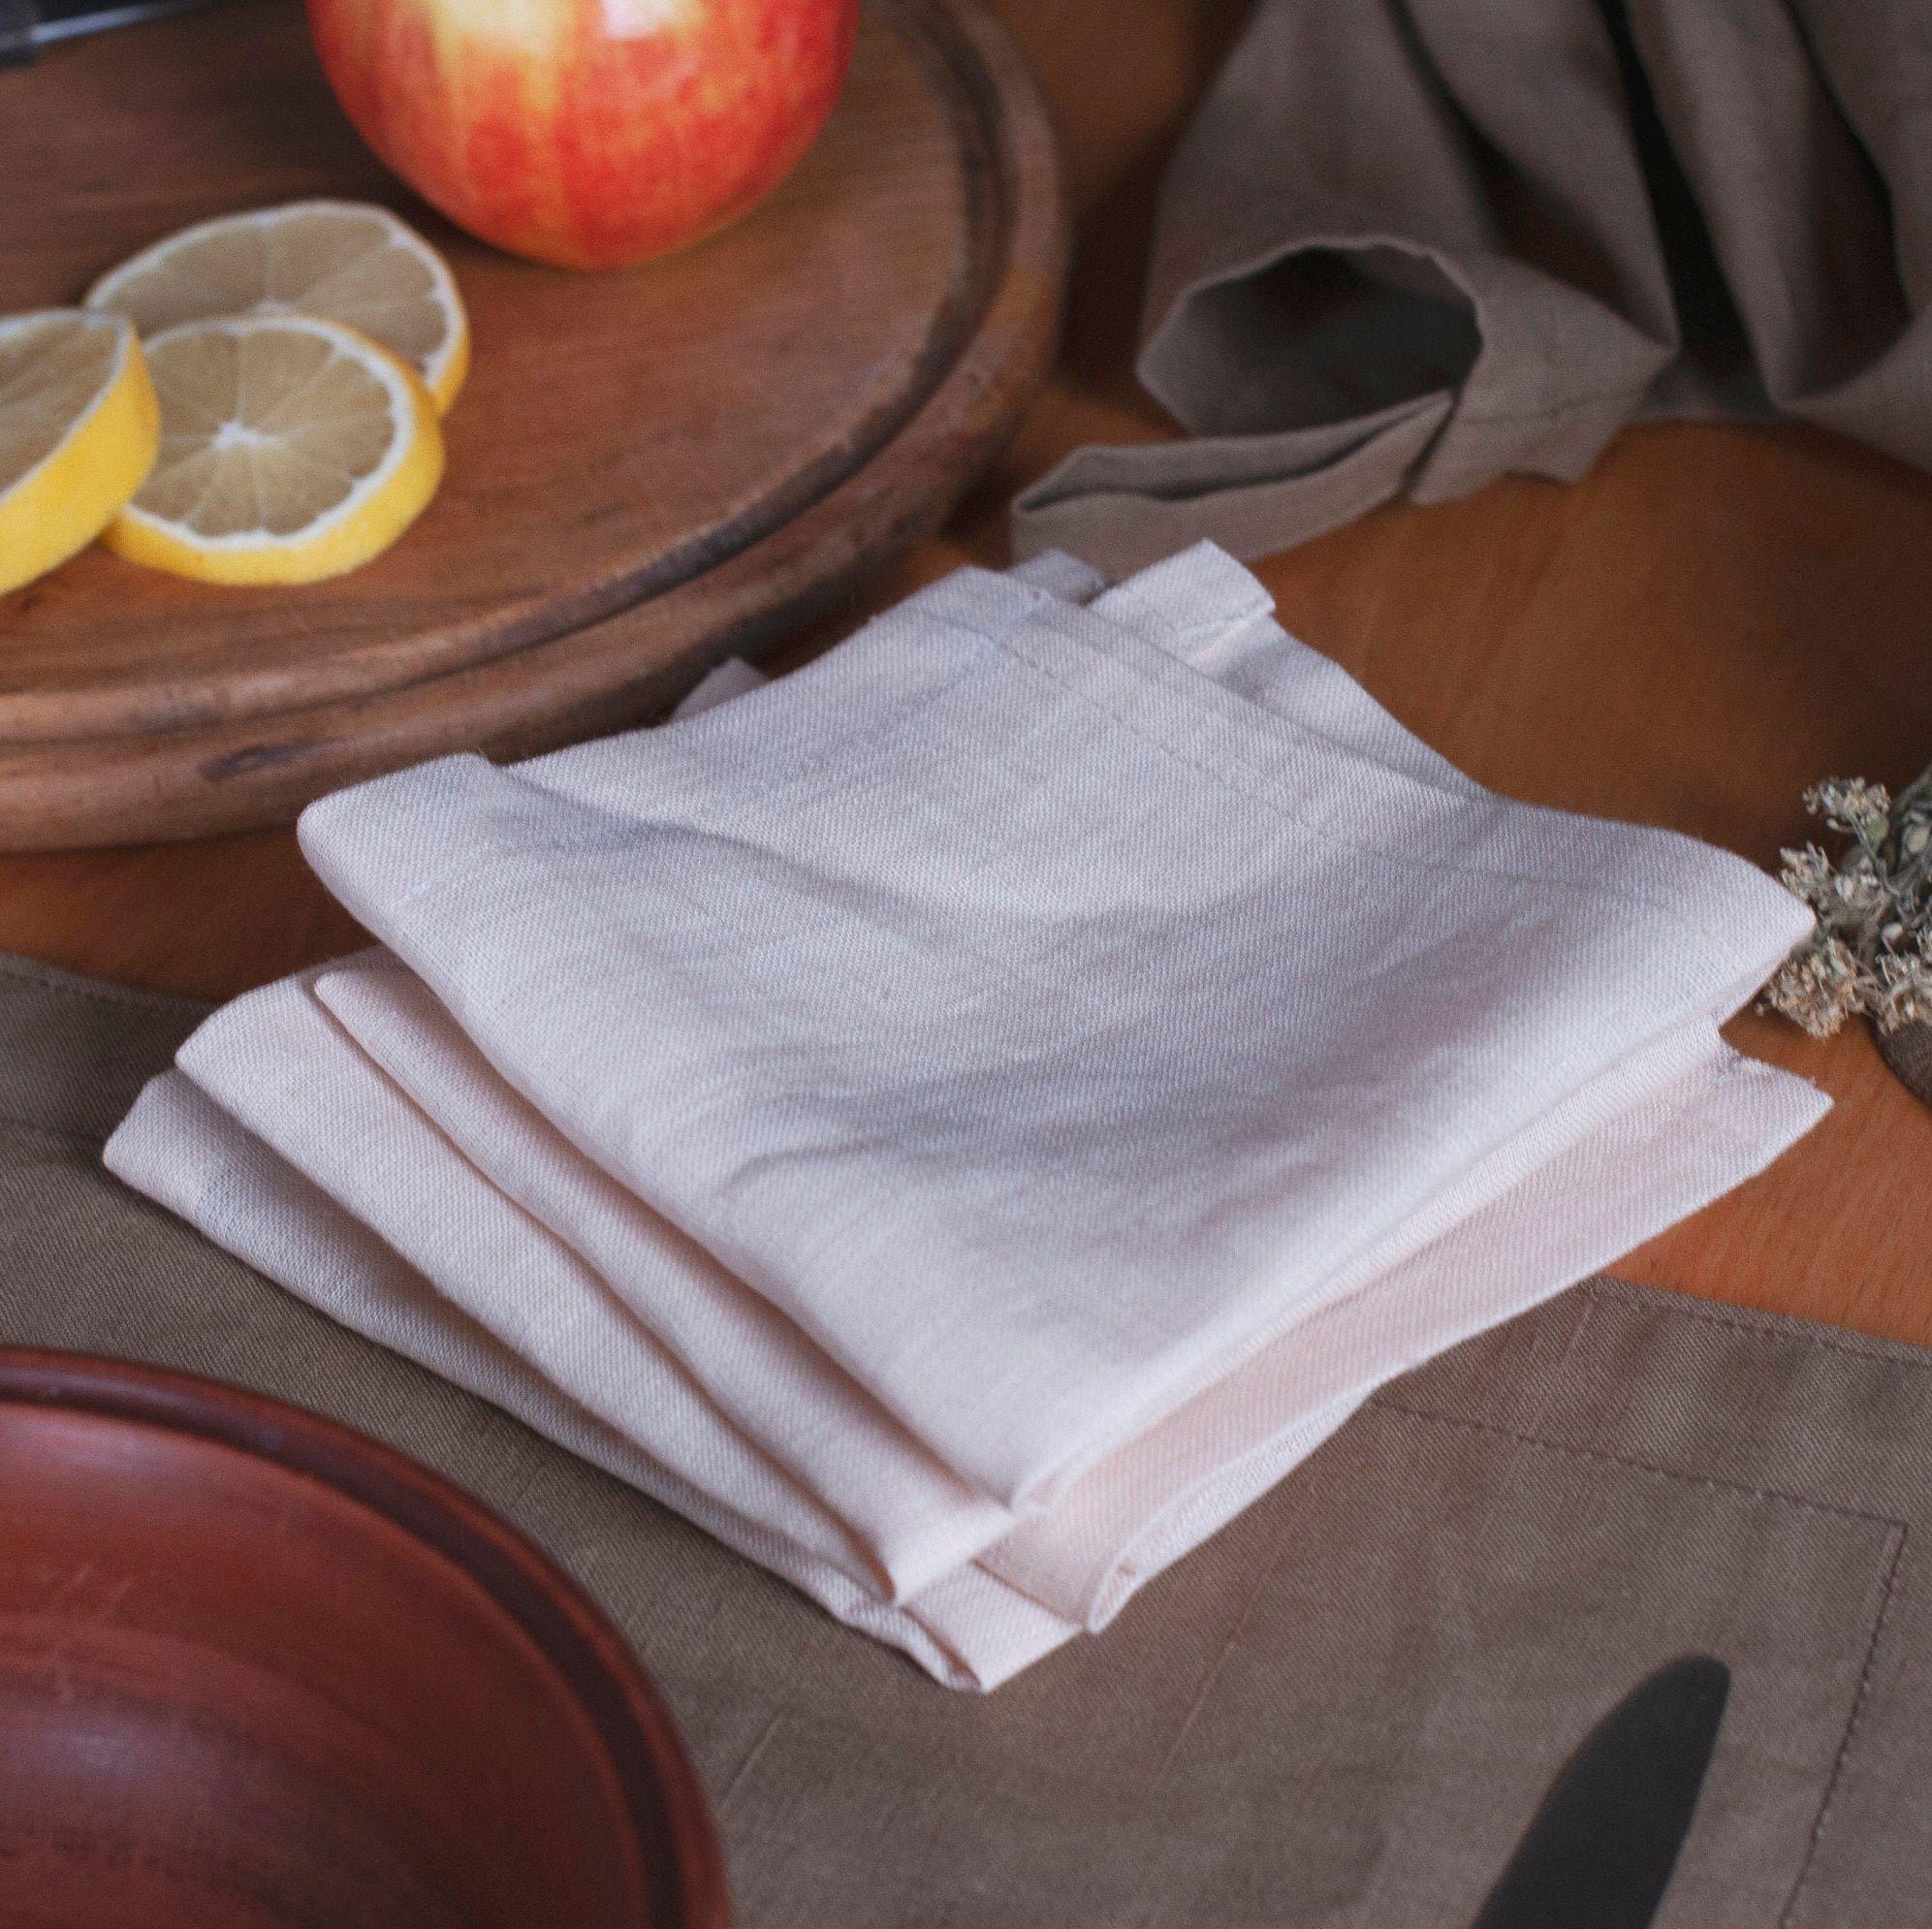 Kitchen linen napkins Dinner table cloth napkin set Rustic wedding napkins bulk Cocktail napkin #clothnapkins